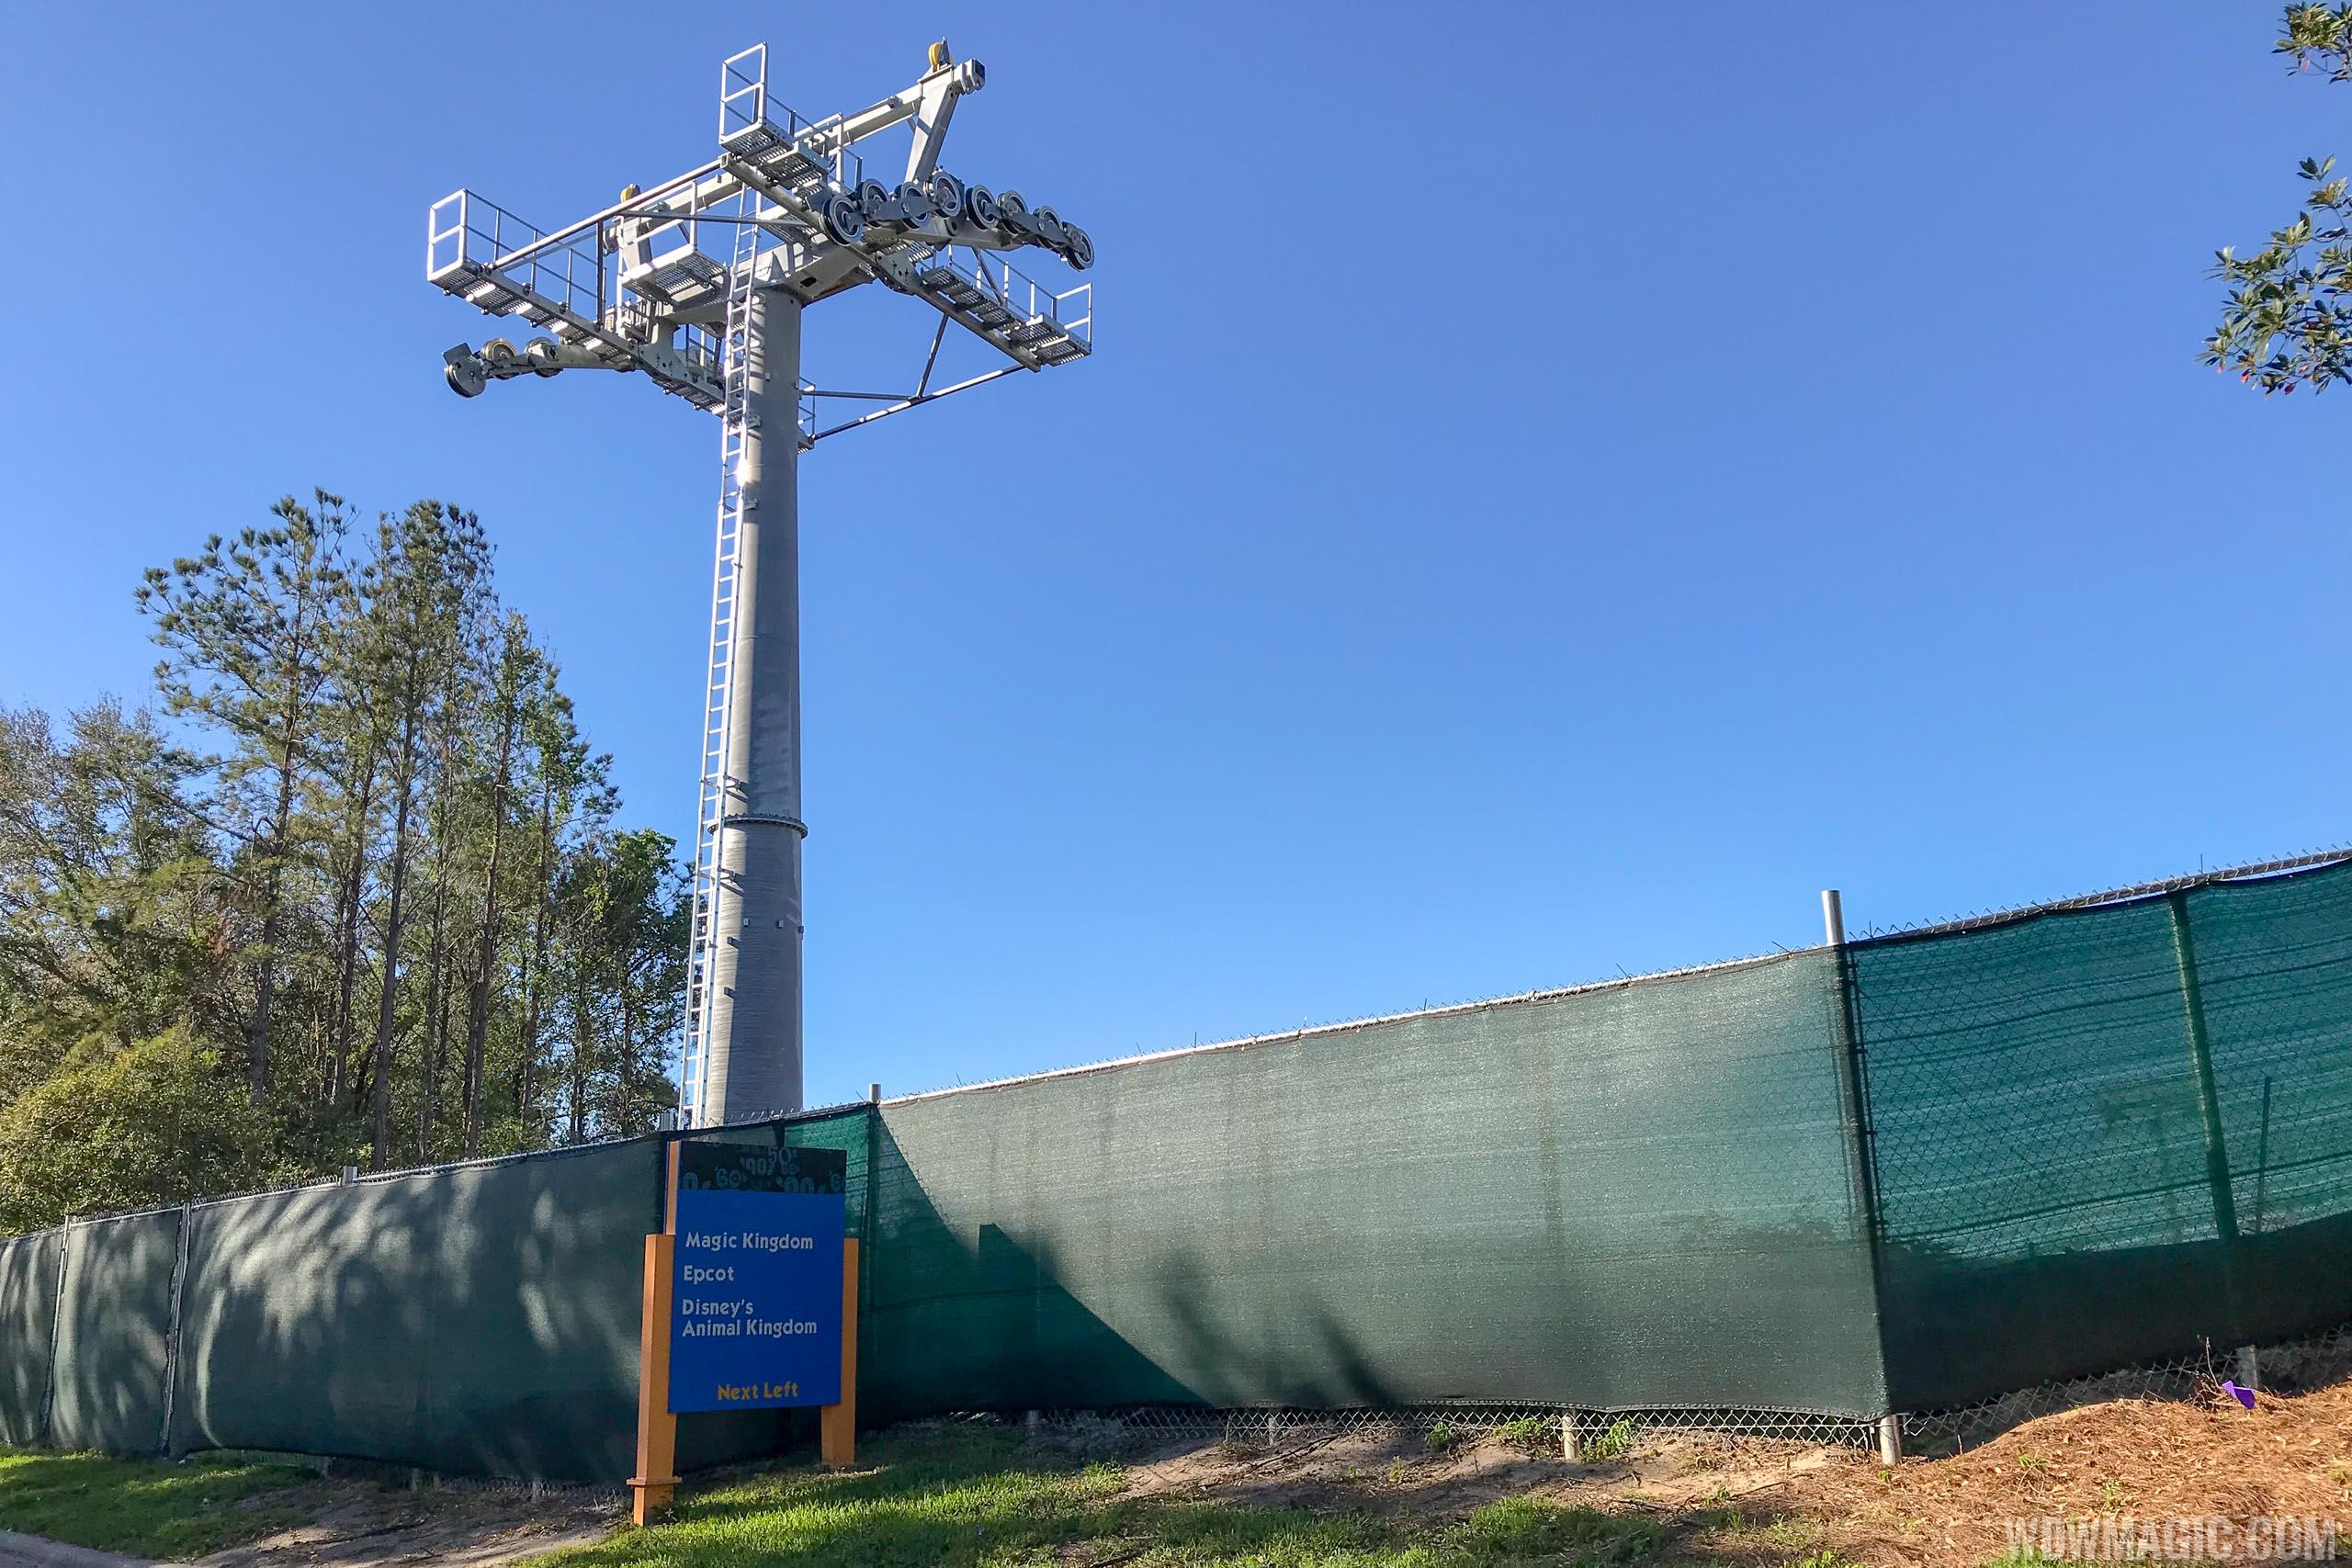 PHOTOS - Disney Skyliner gondola construction update